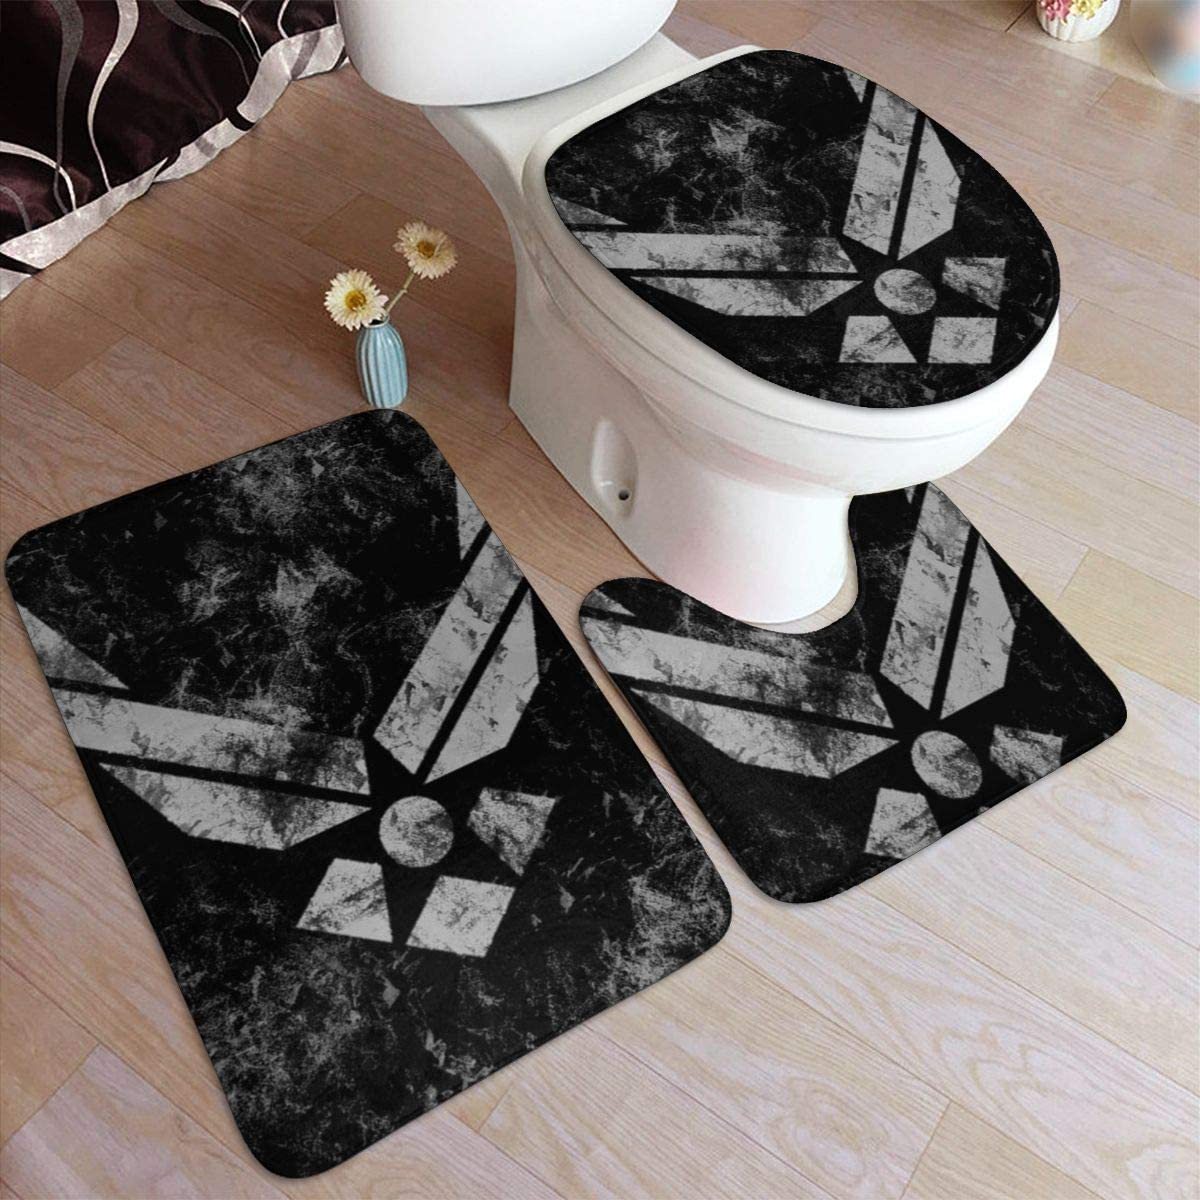 Amazon Com Vbcdgfg Bathroom Rugs Sets 3 Piece Us Air Force Sign Badge Memory Foam Bathroom Mats Set Bath Rug Contour Mat Lid Cover Non Slip Home Kitchen